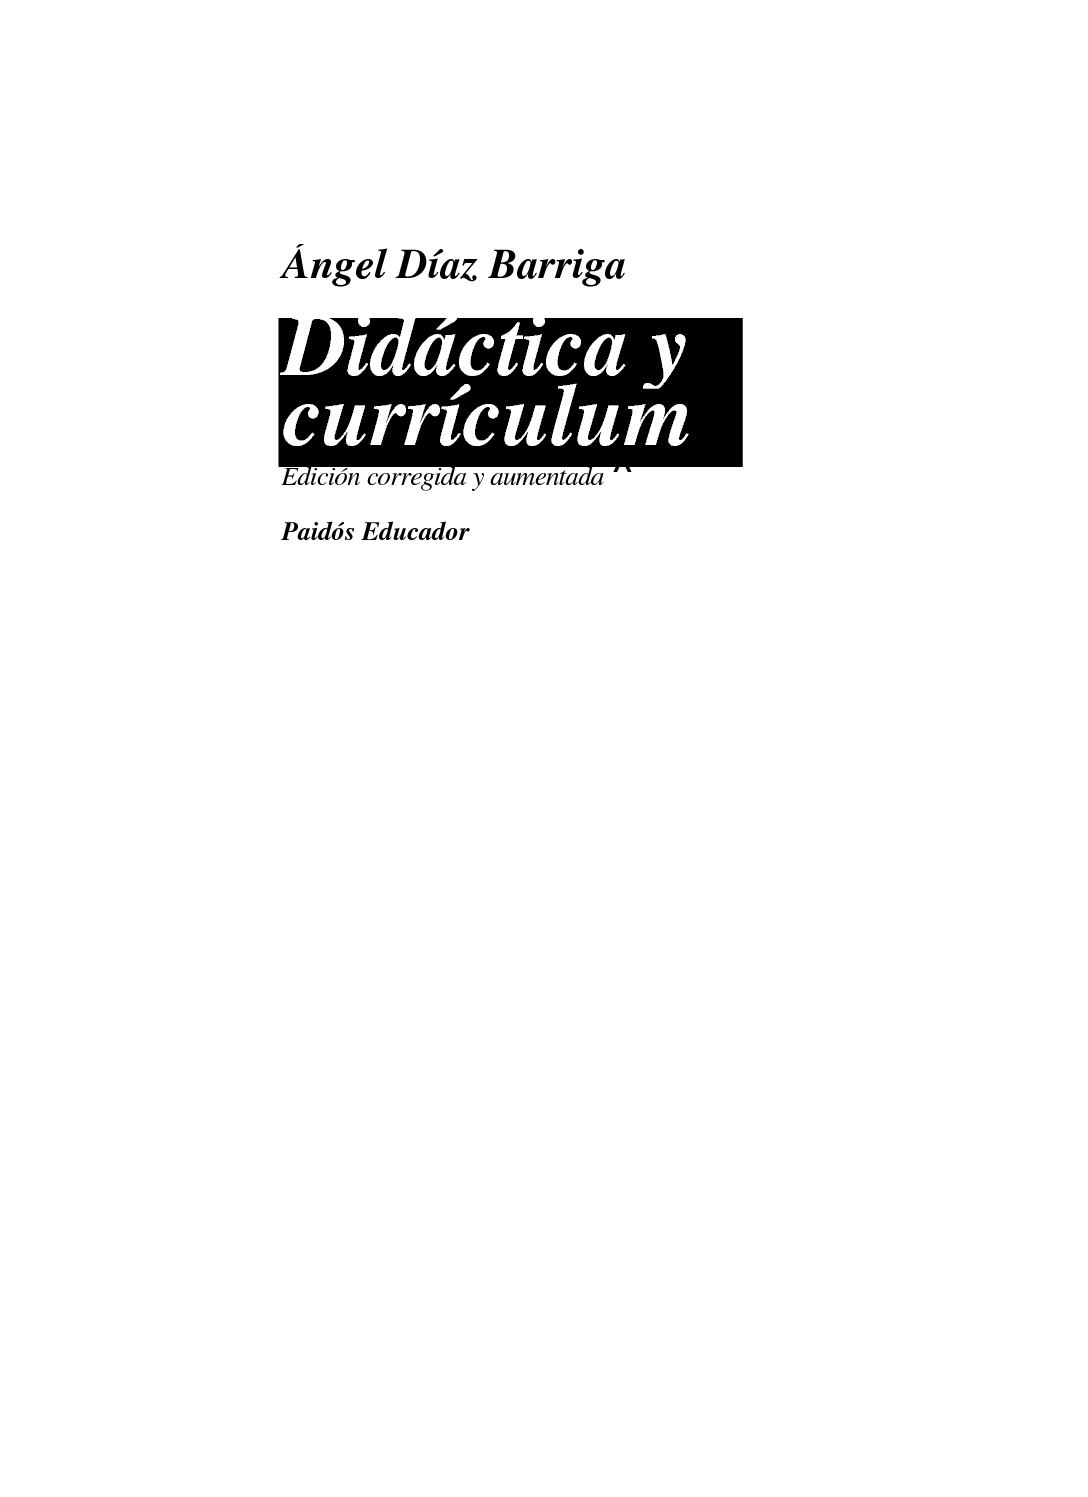 Calaméo - Angel Diaz Barriga Didactica Y Curriculum